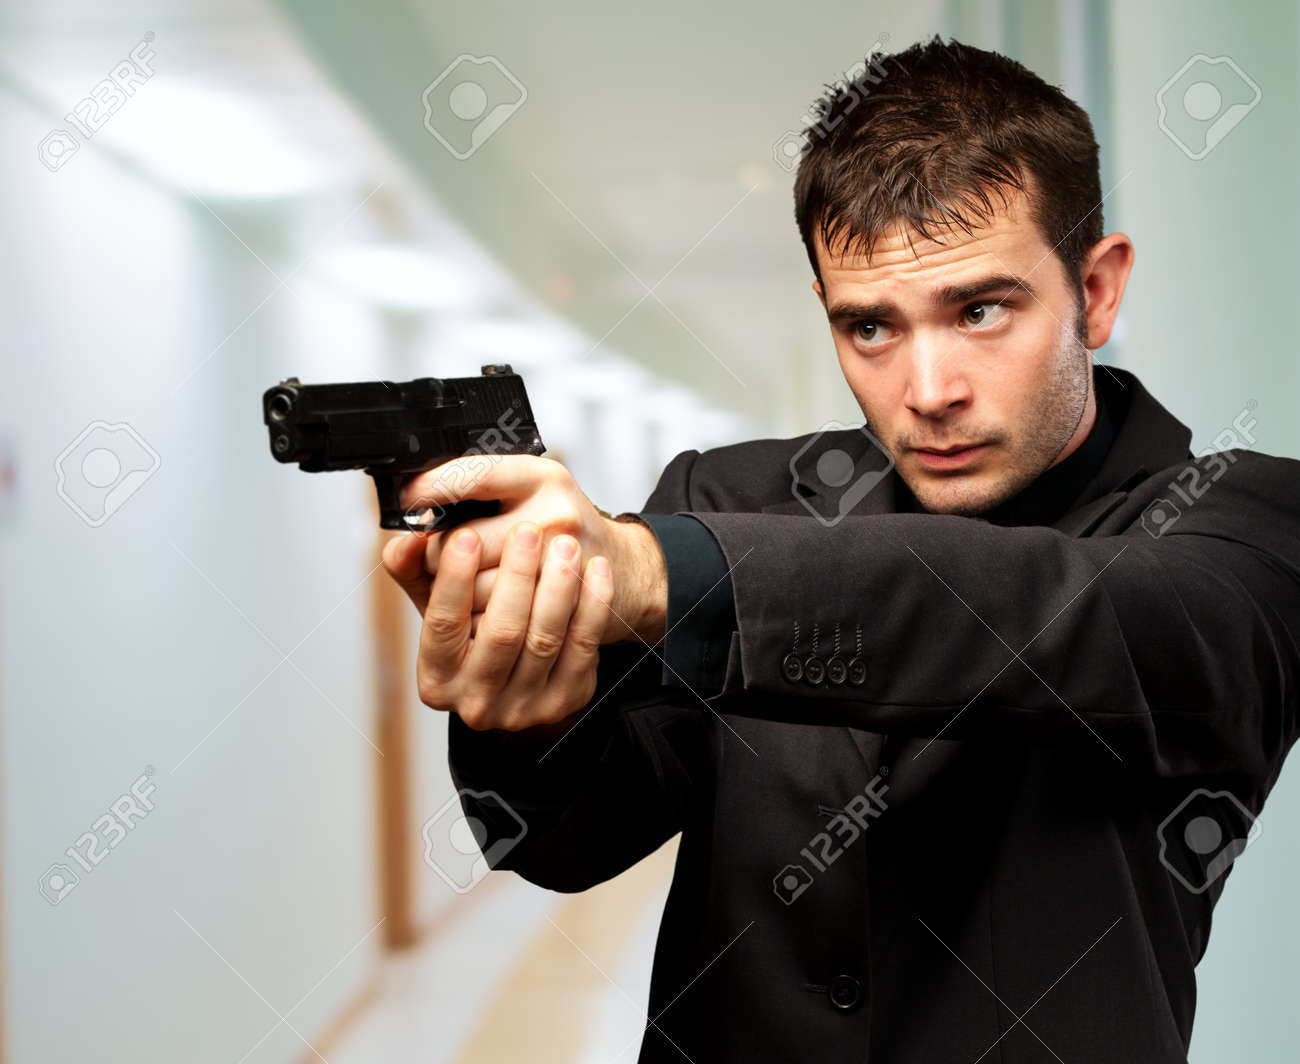 Man Holding Gun, indoor - 16672347